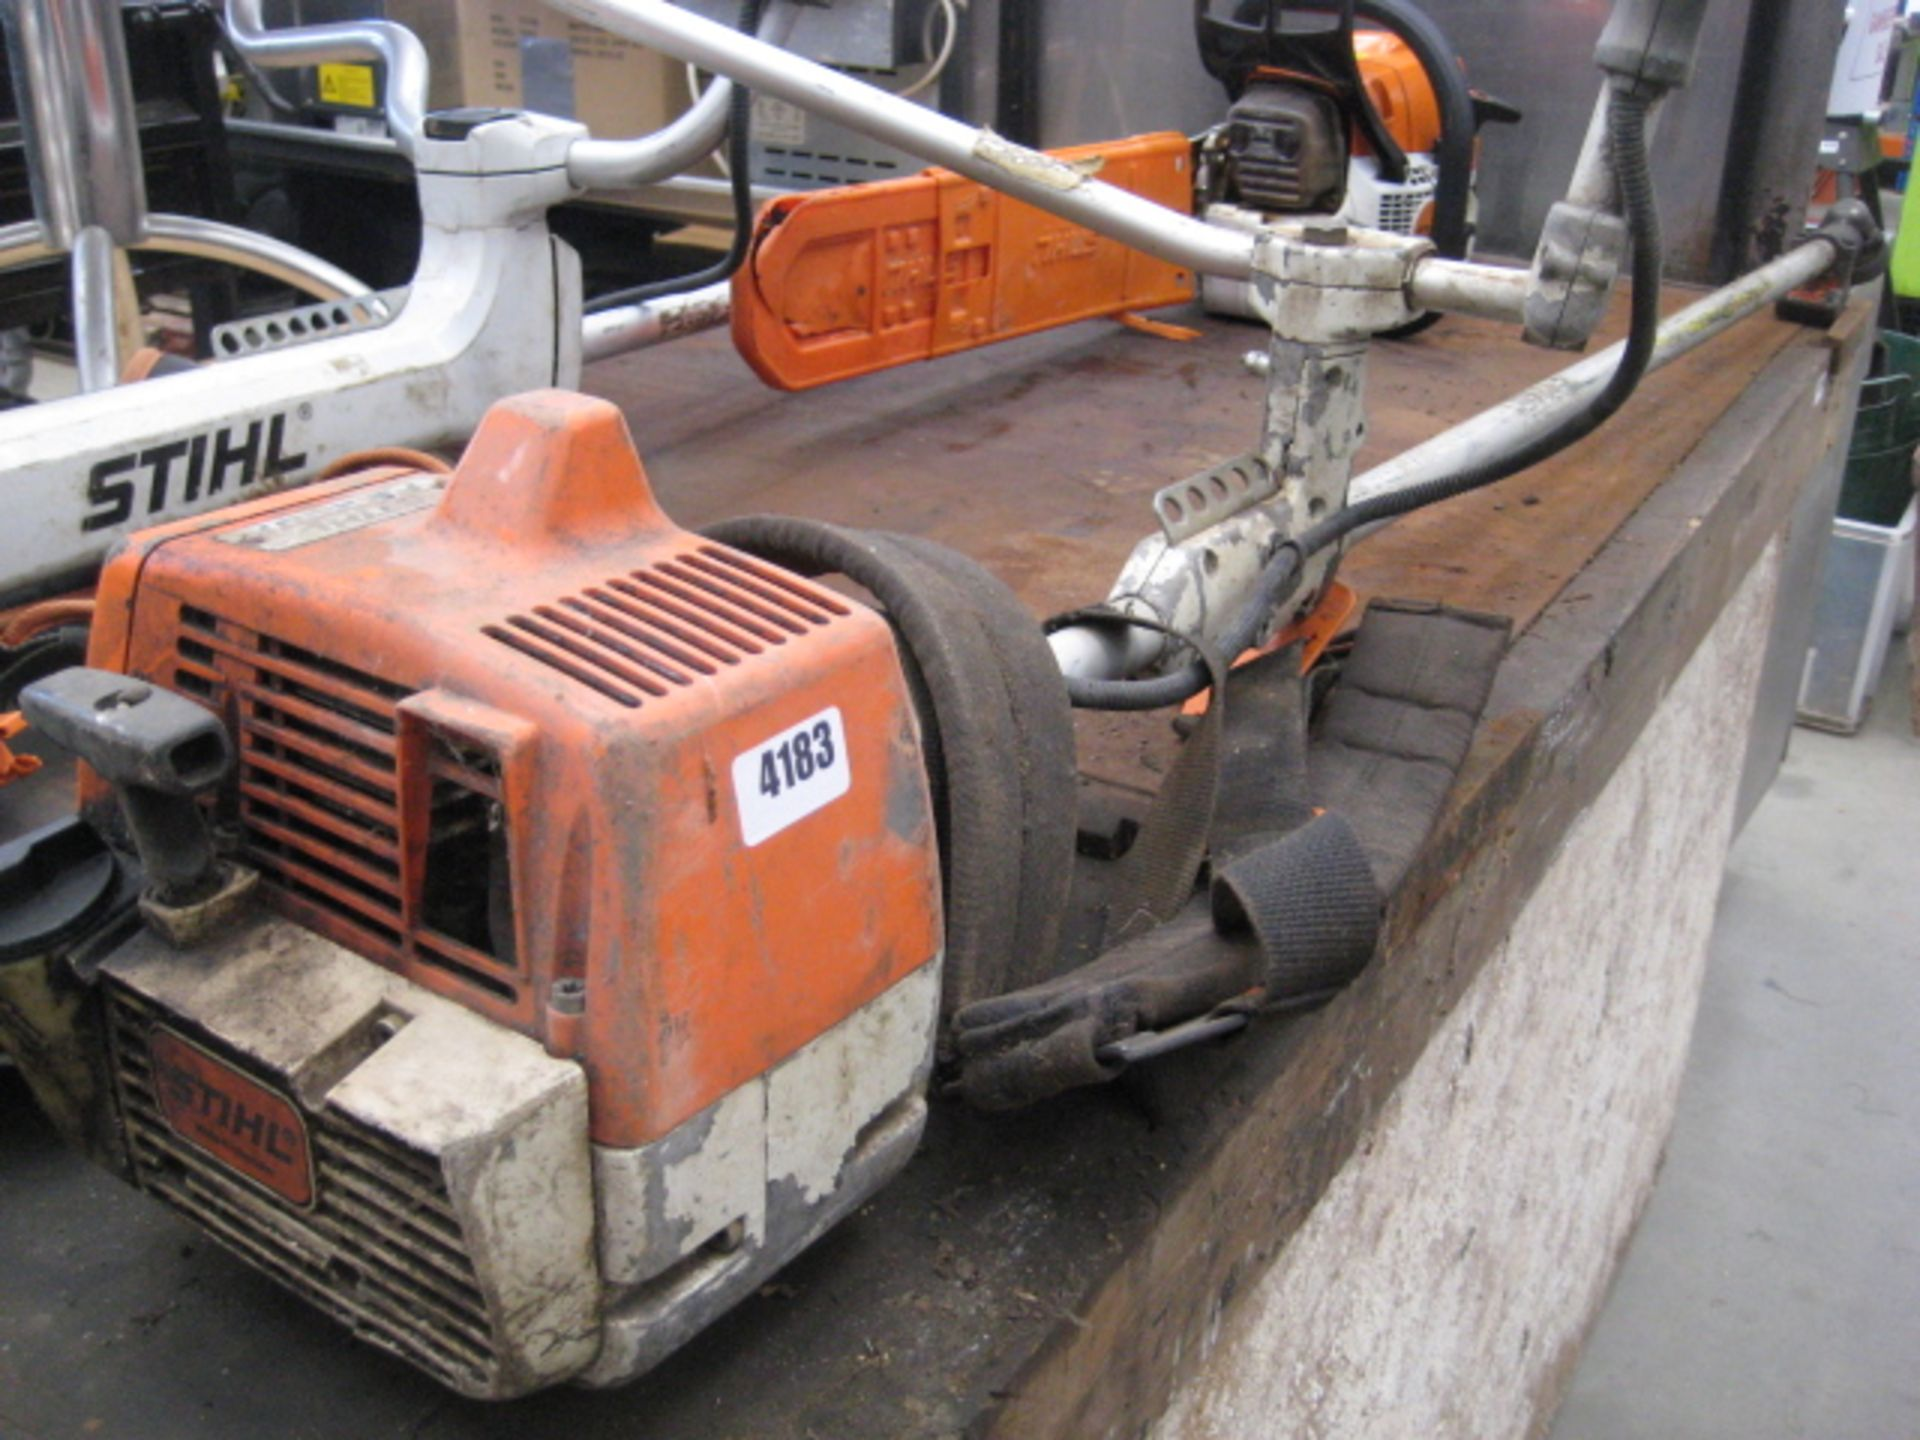 Lot 4183 - Stihl FS280K brush cutter